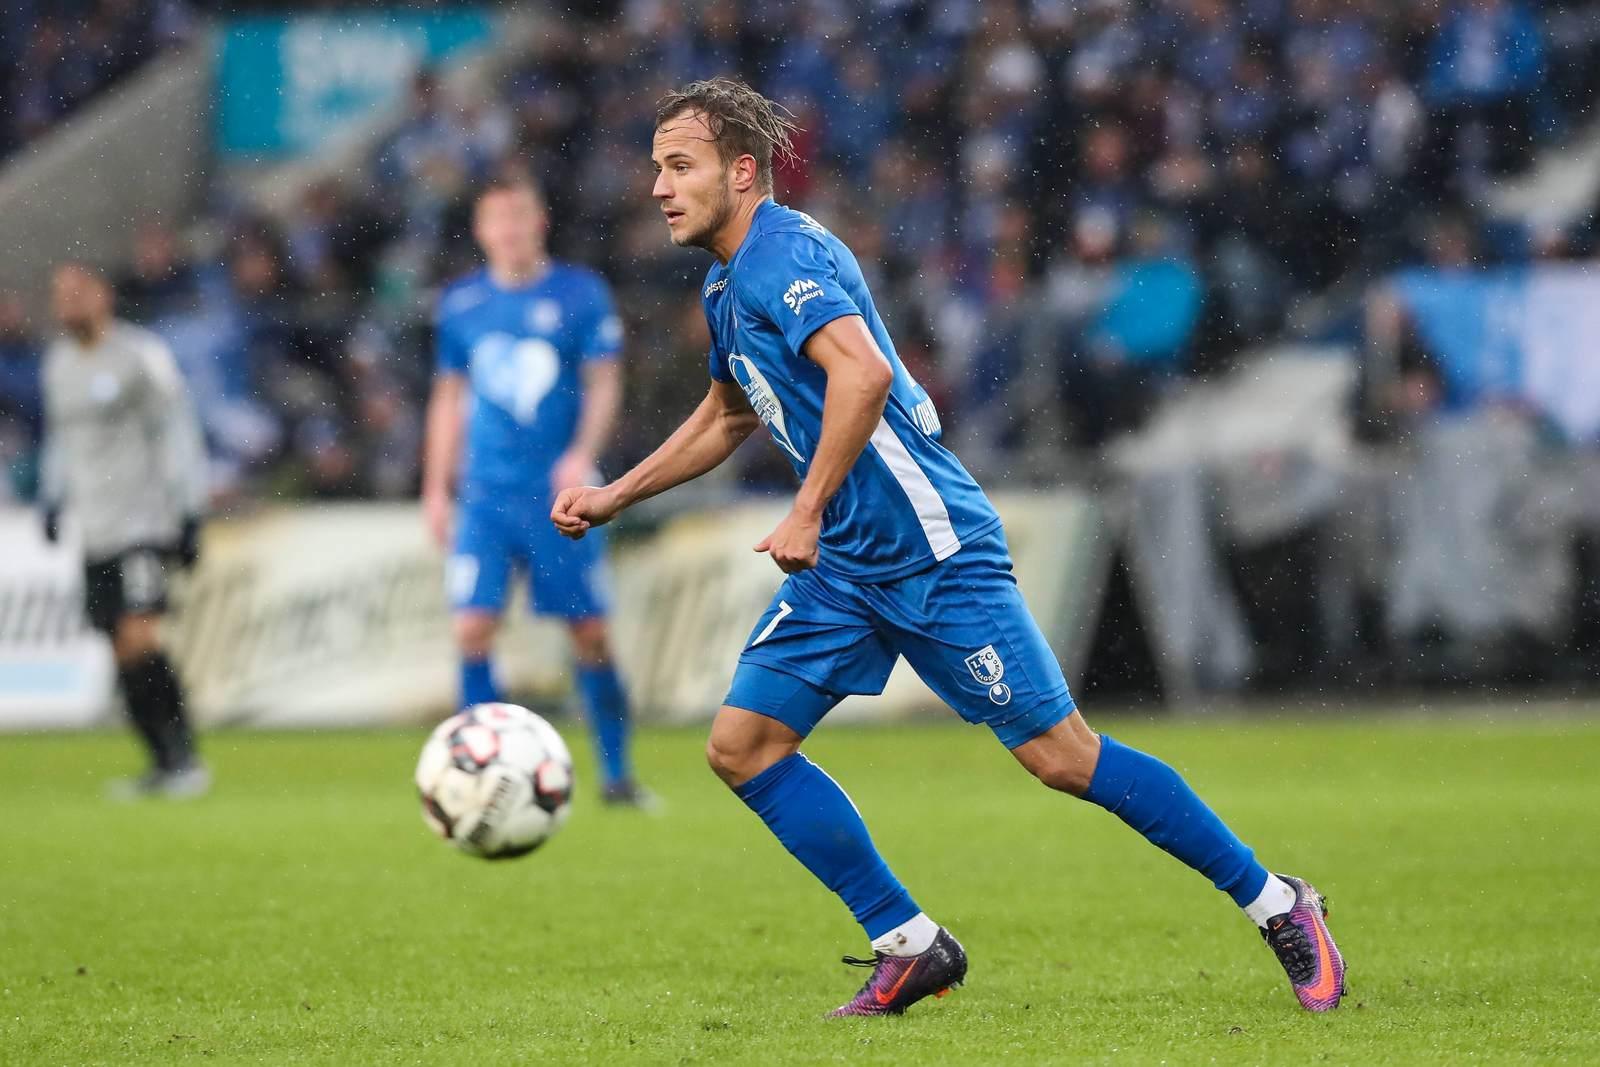 Felix Lohkemper am Ball für den 1. FC Magdeburg.